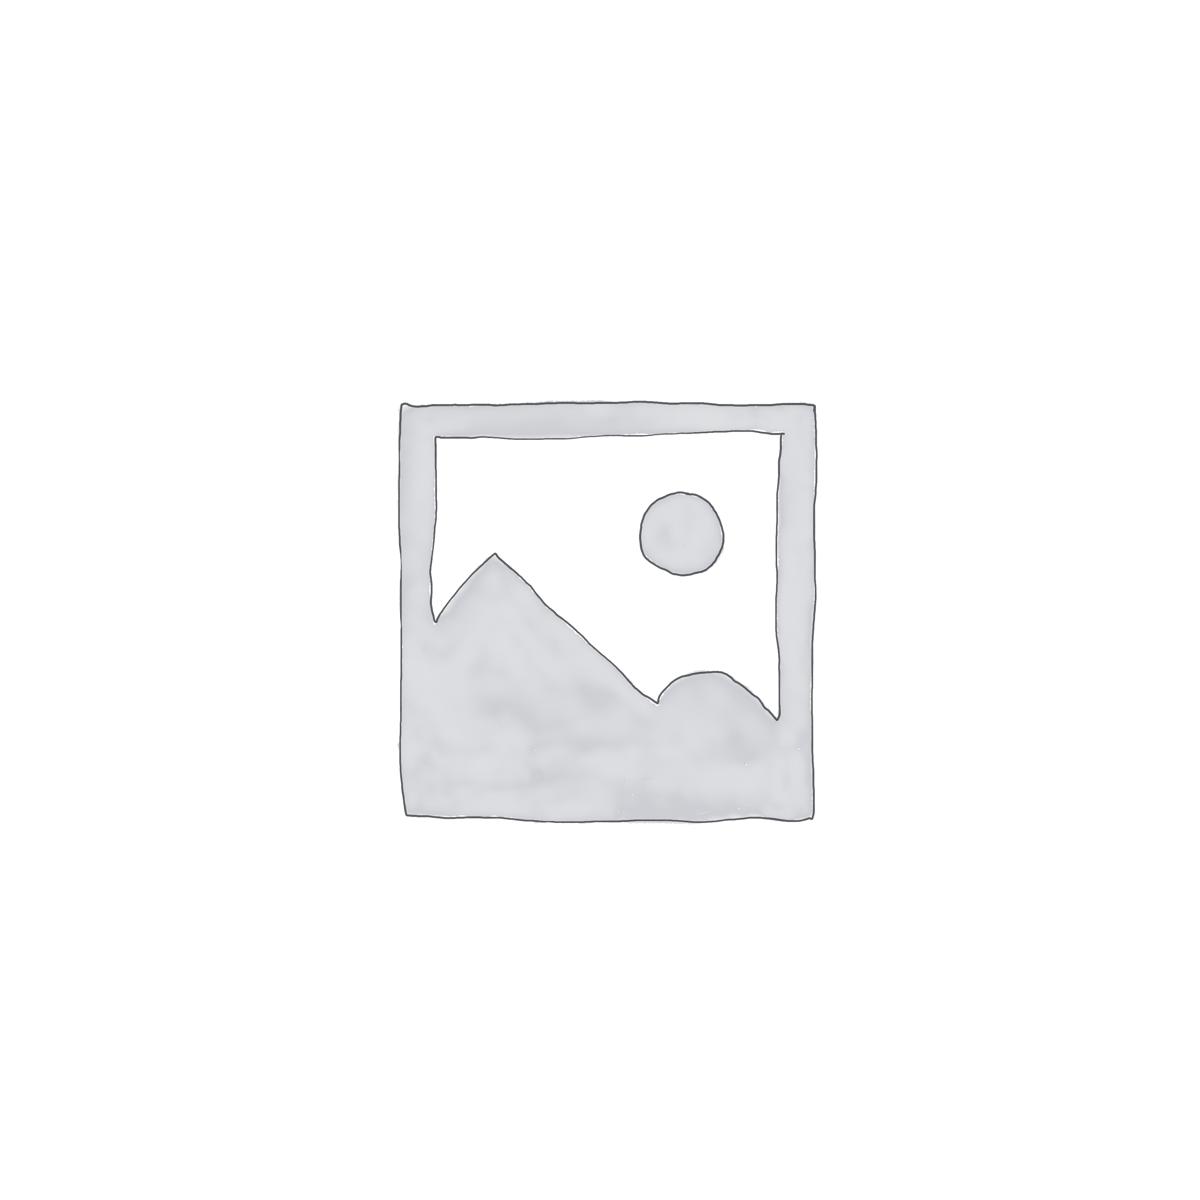 Soft Play 1130-1330 31/07/2021